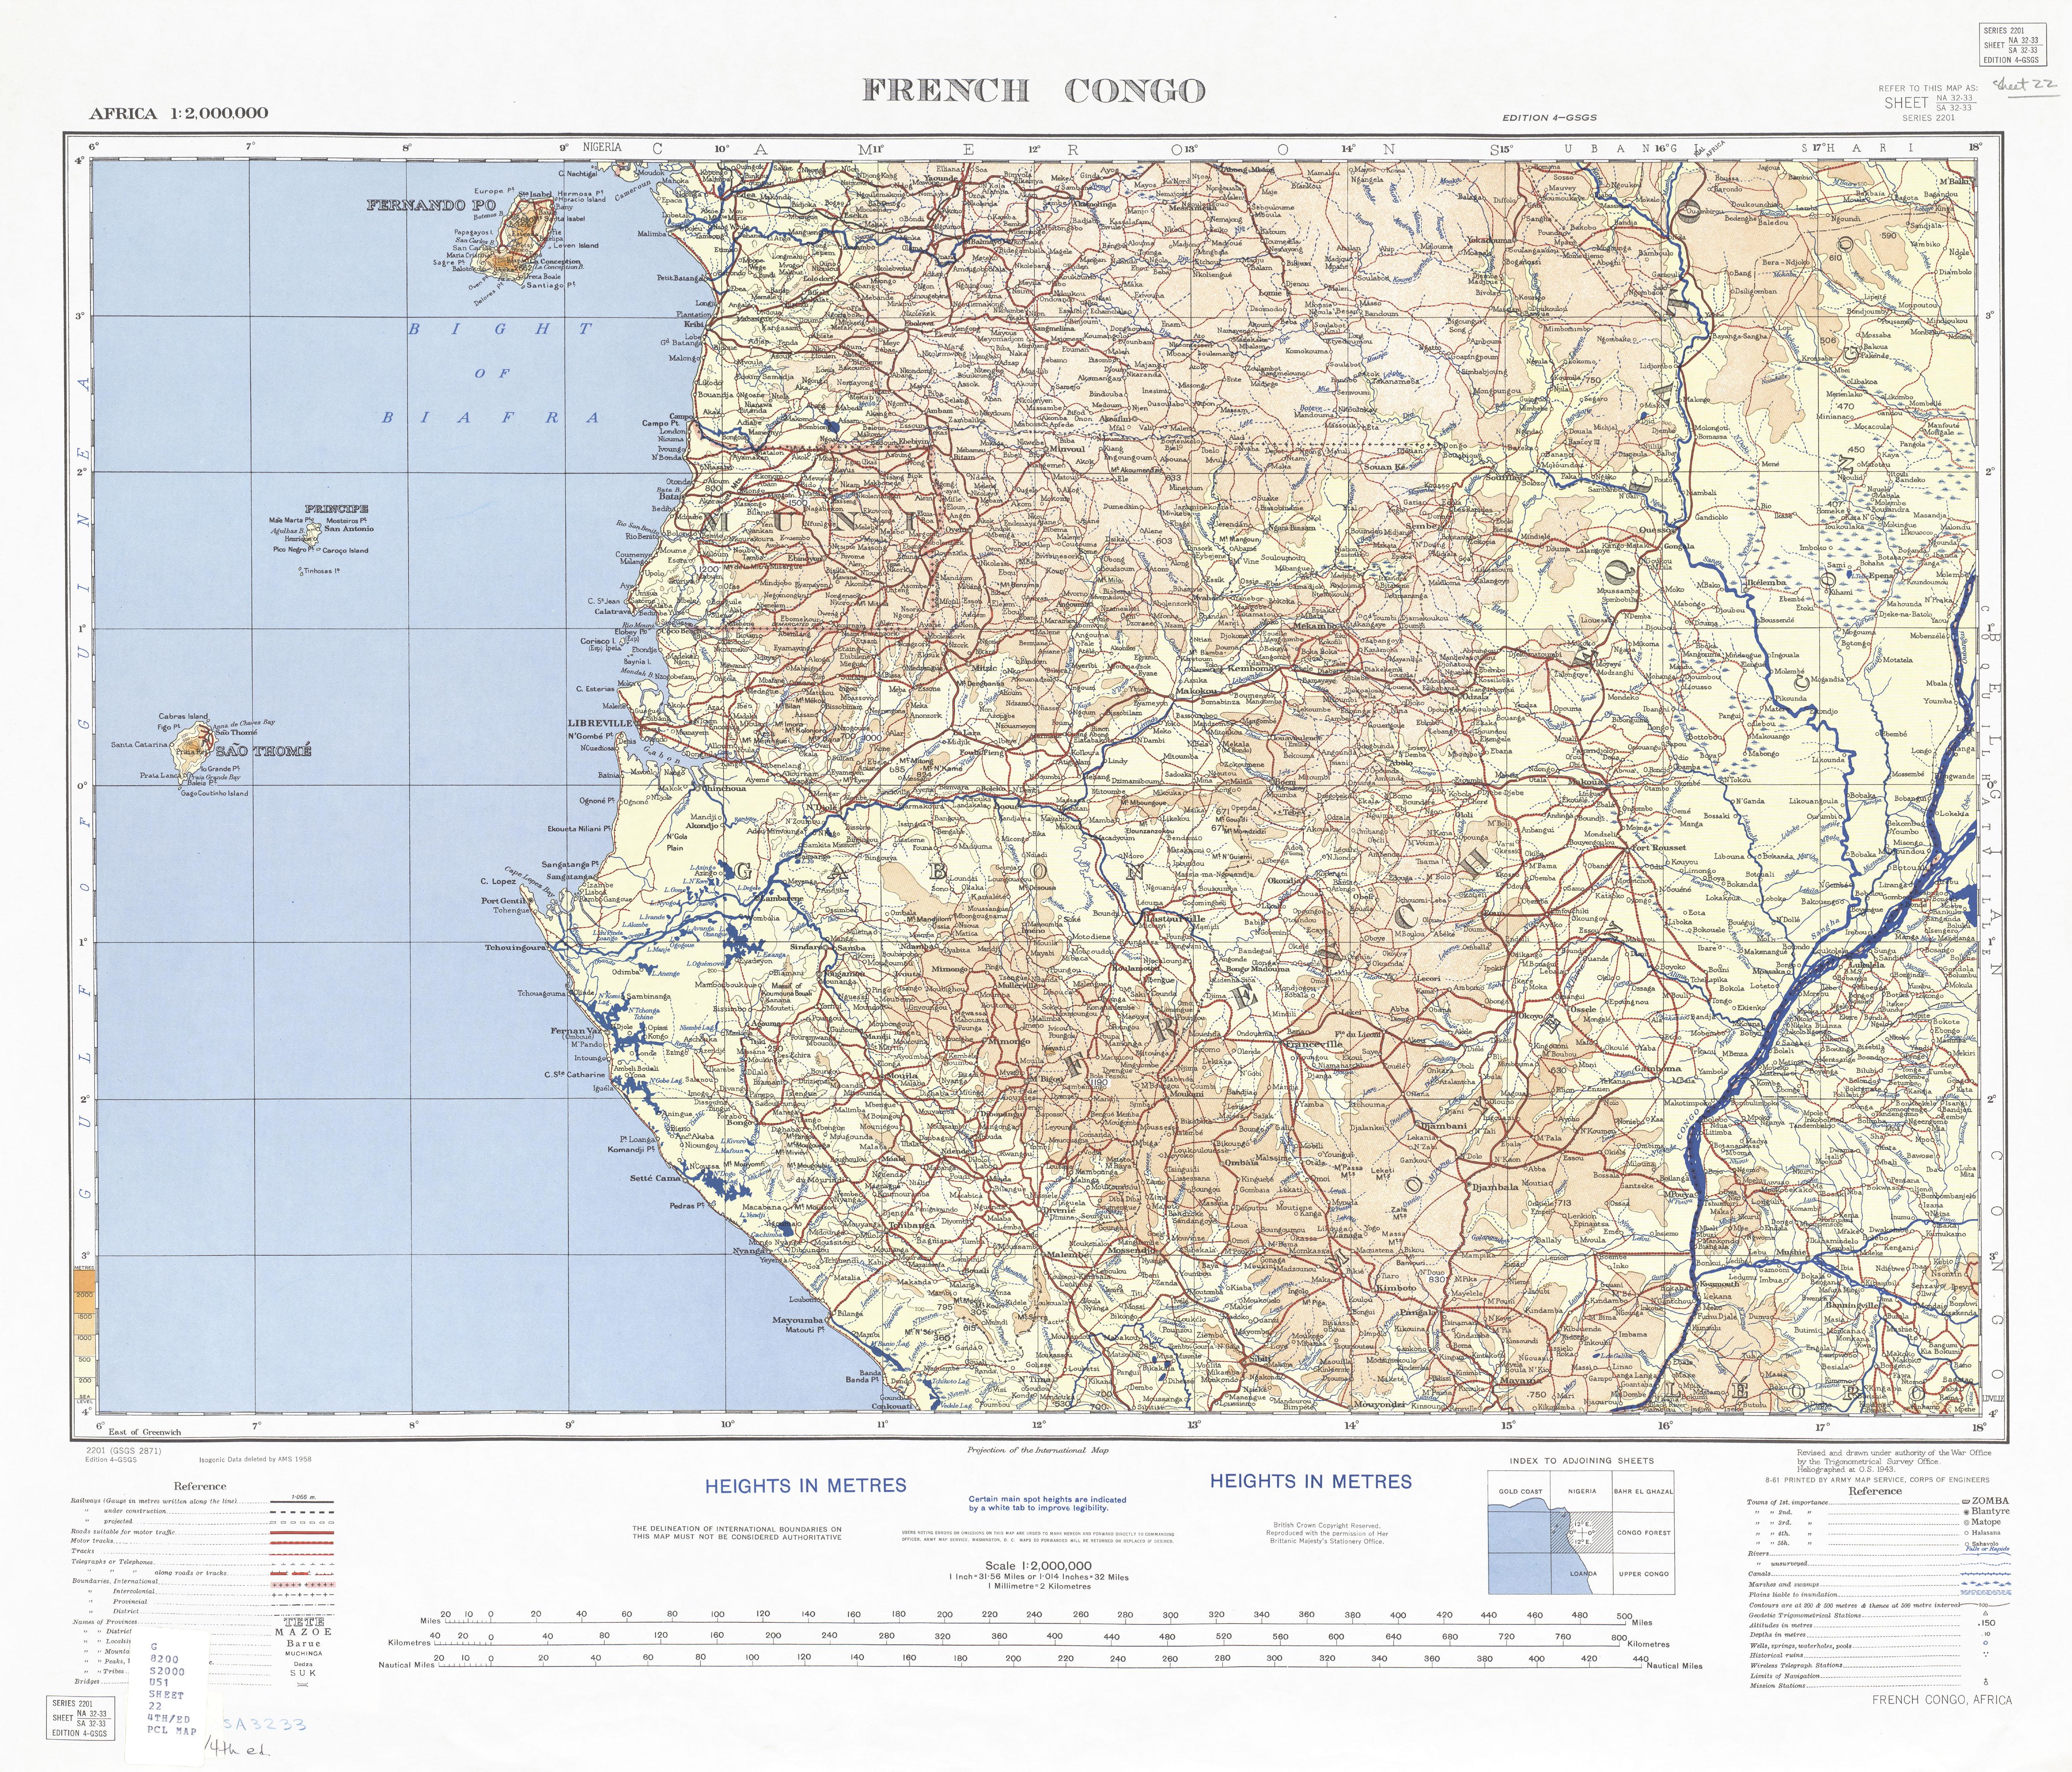 Sao Tome And Principe Maps PerryCastañeda Map Collection UT - Sao tome and principe map